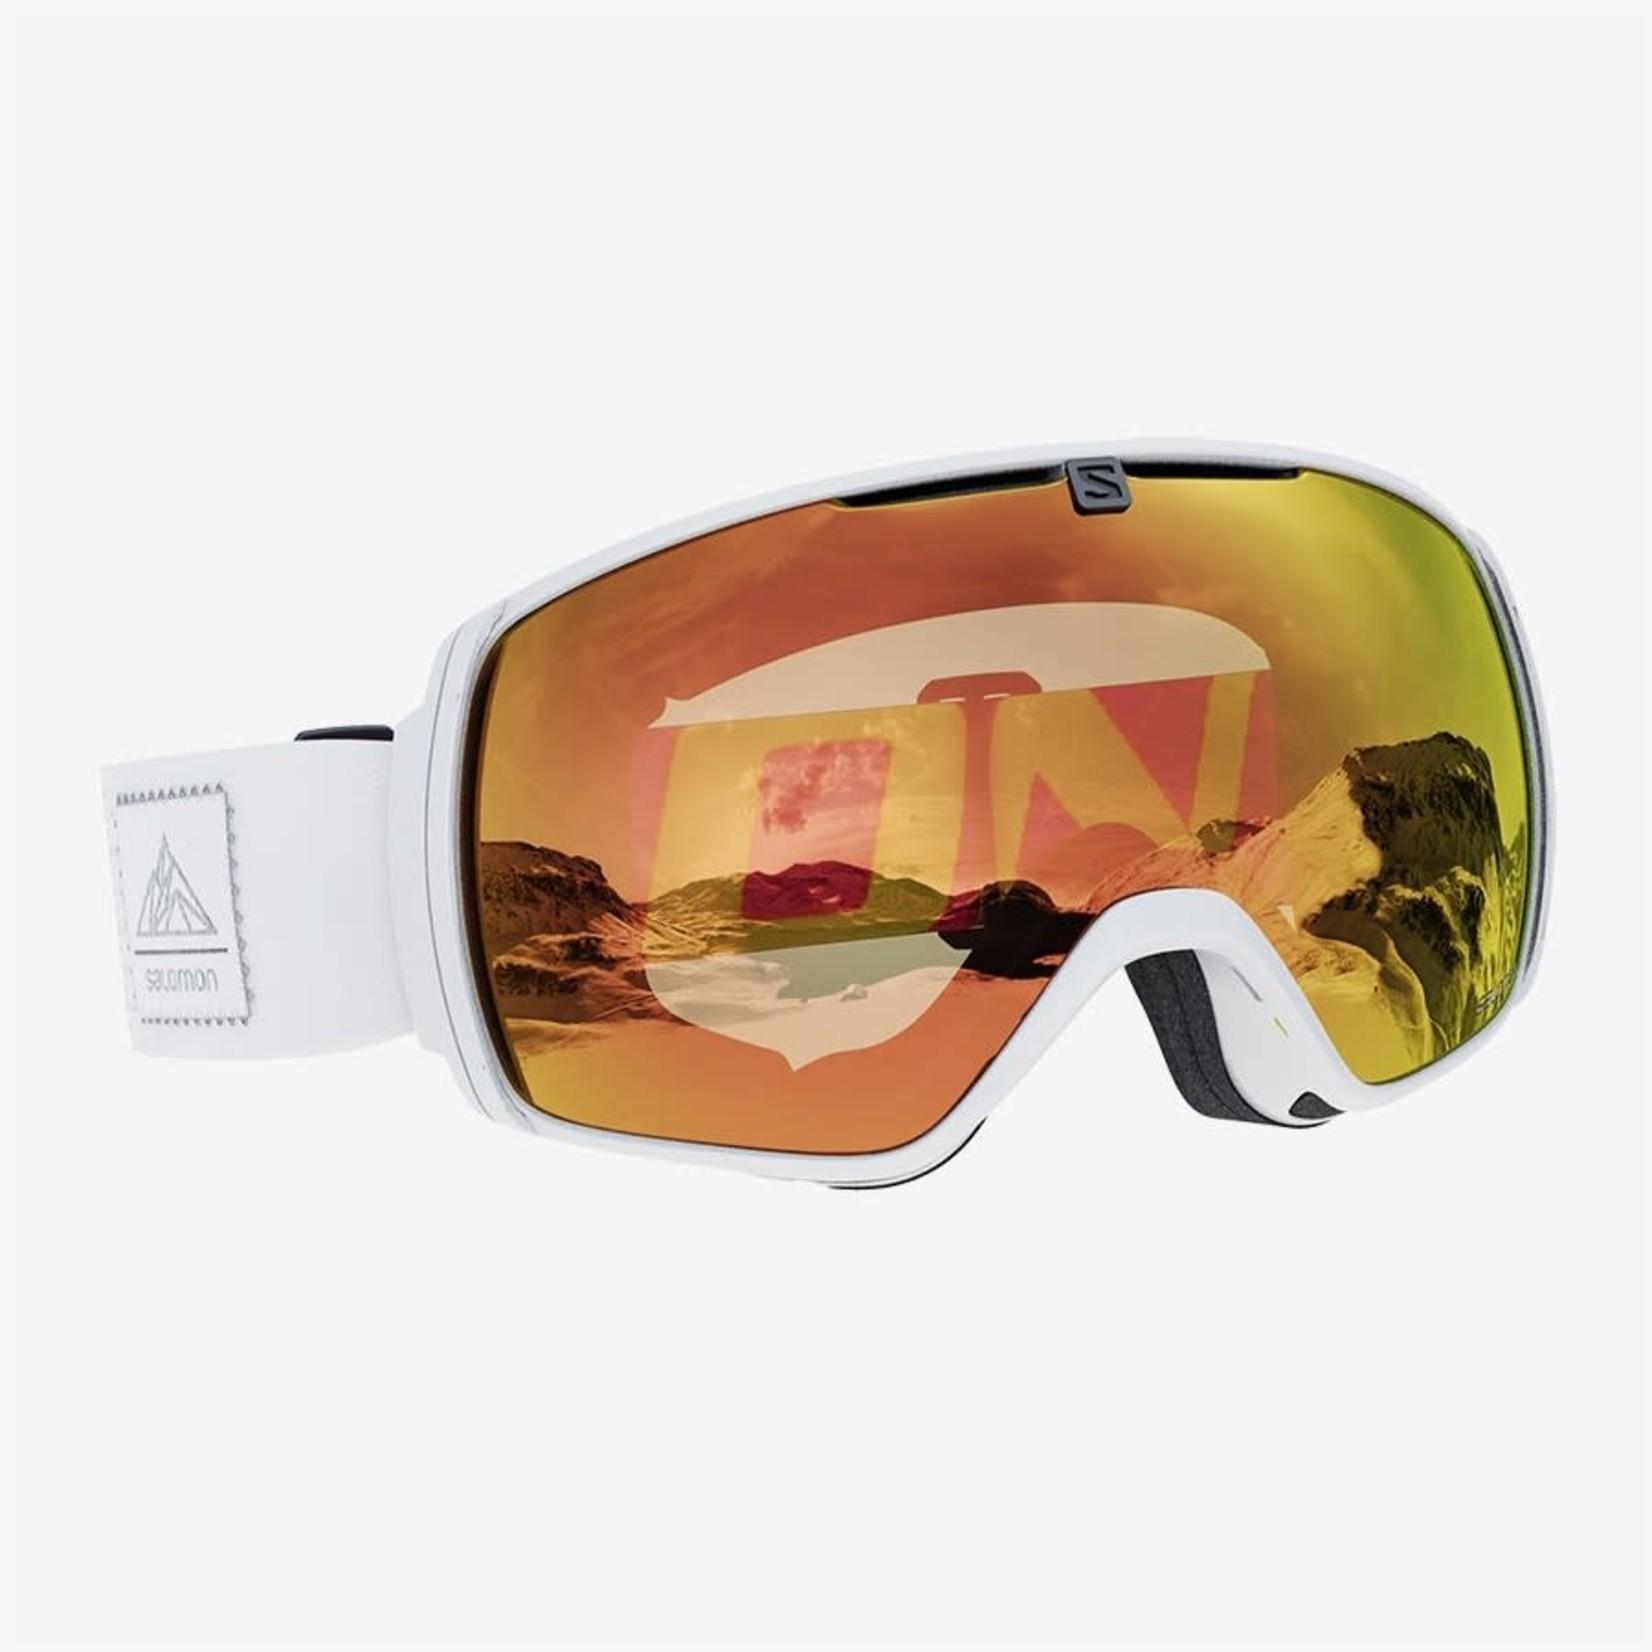 Salomon Lunette de ski Salomon XT One Photochromic Sigma  - Homme